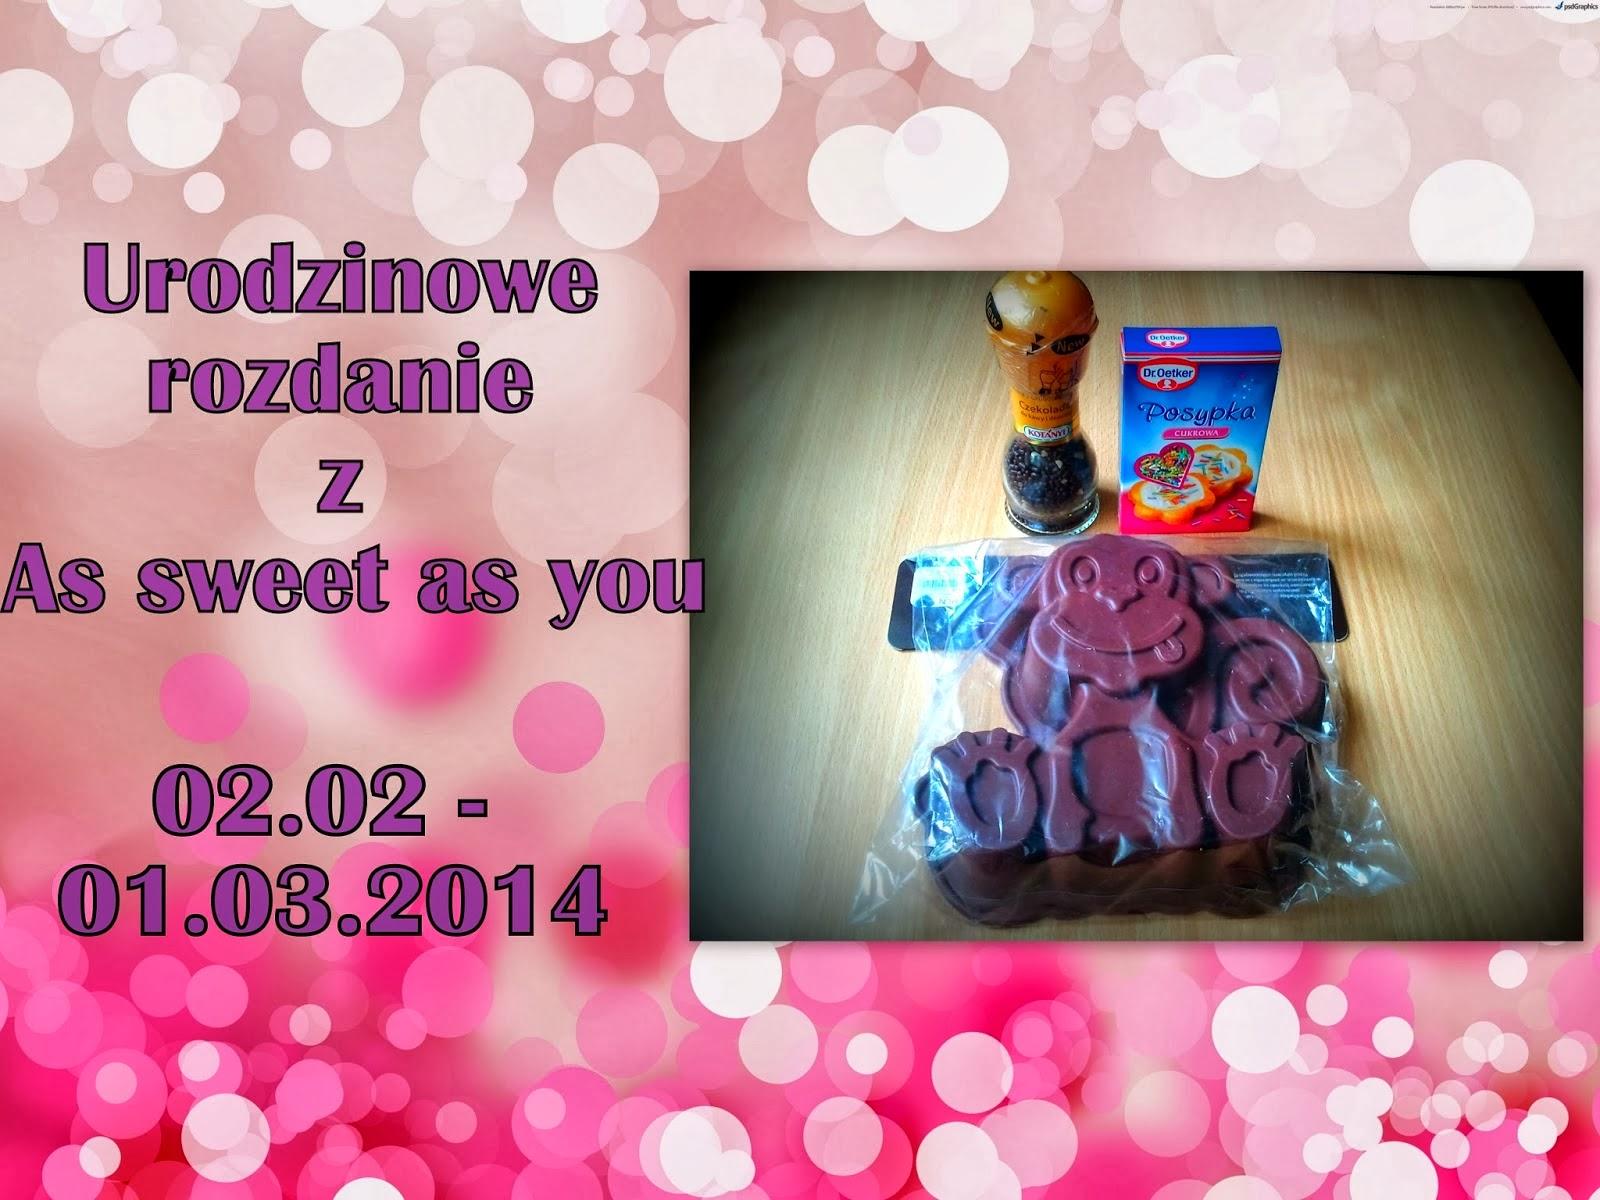 http://assweetasyou.blogspot.com/2014/02/pierwsze-urodziny-as-sweet-as-you.html